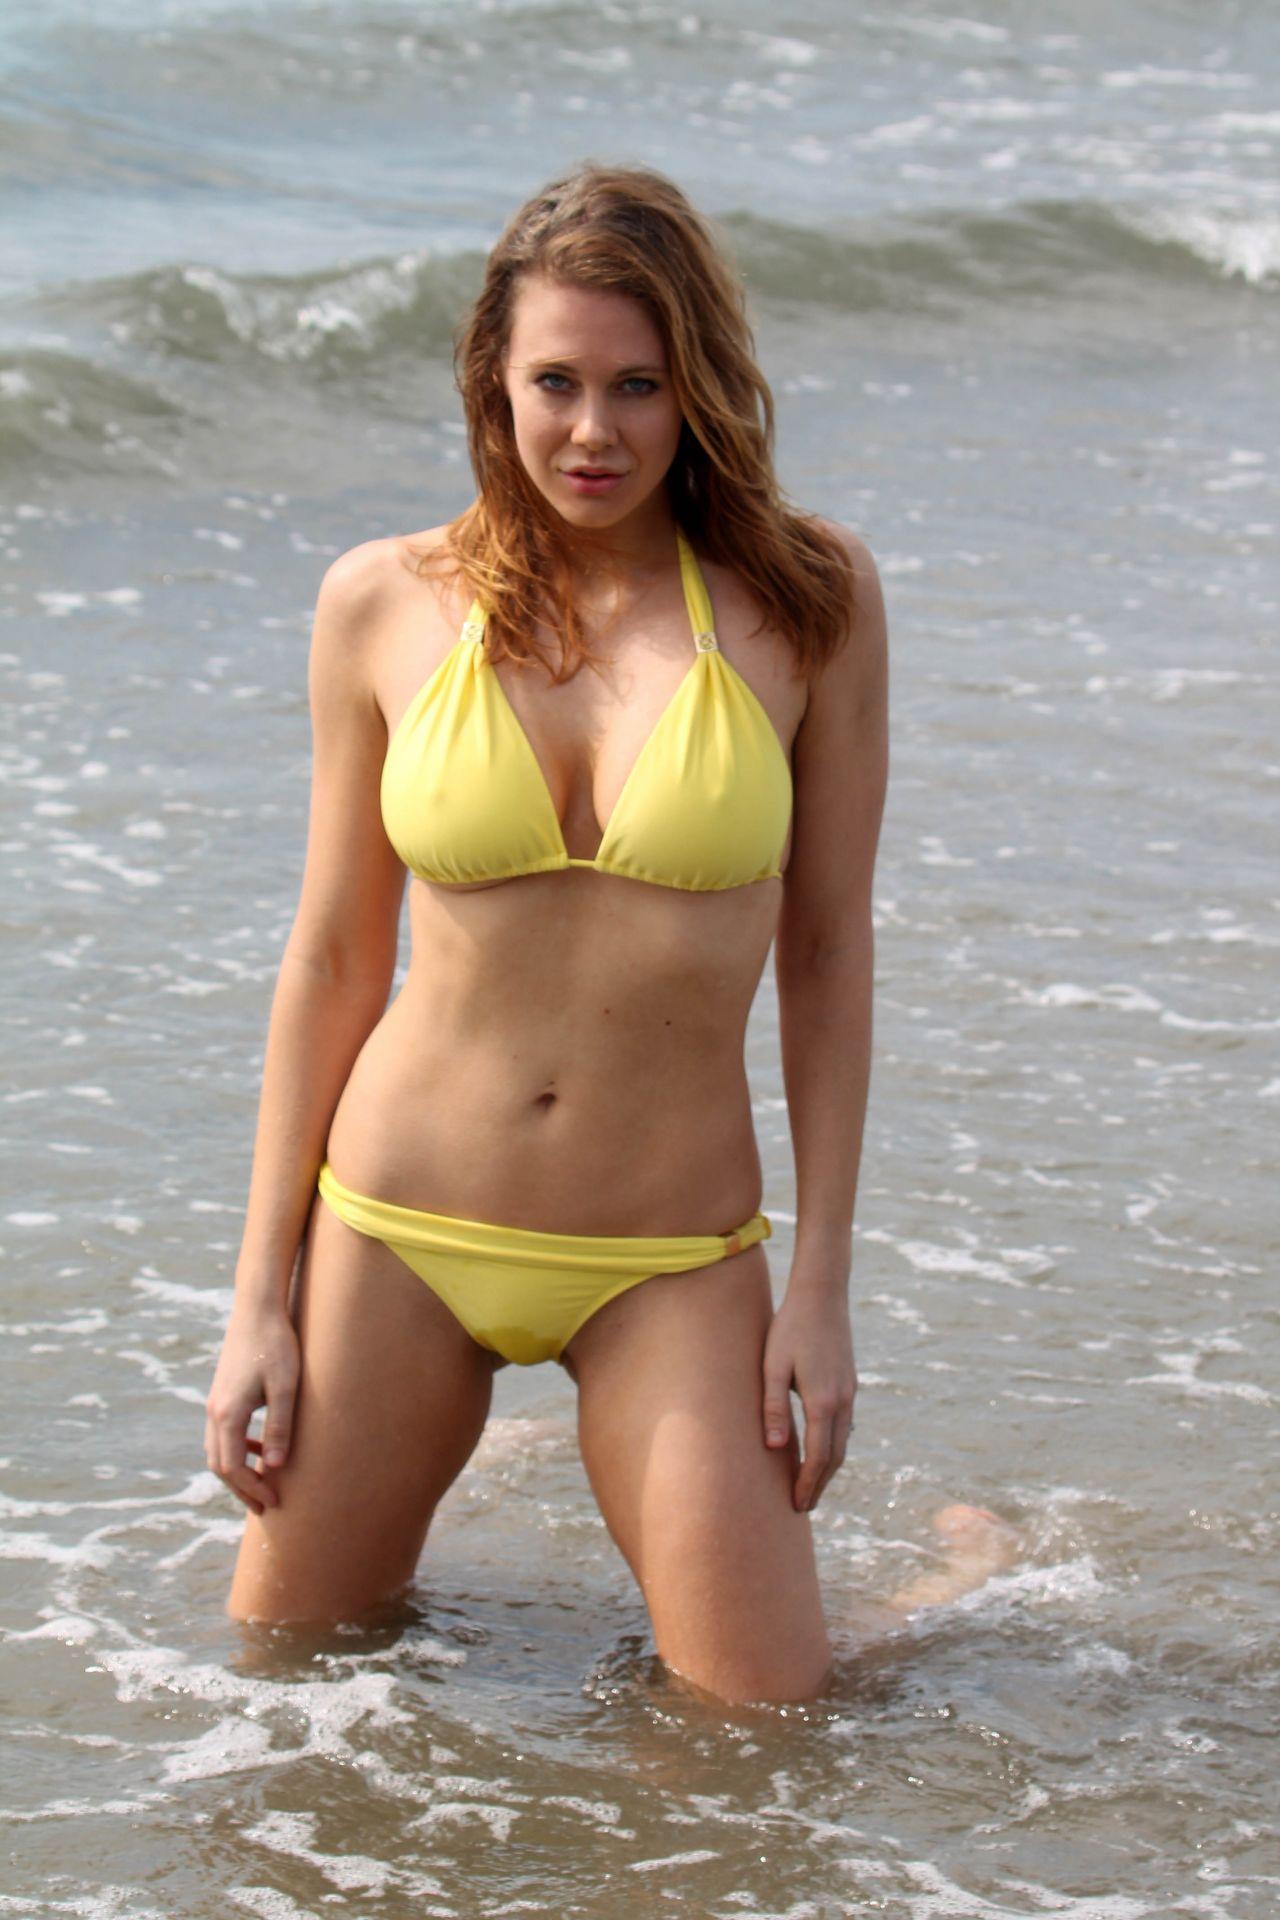 Maitland Ward Bikini Pics Beach In Marina Del Rey July